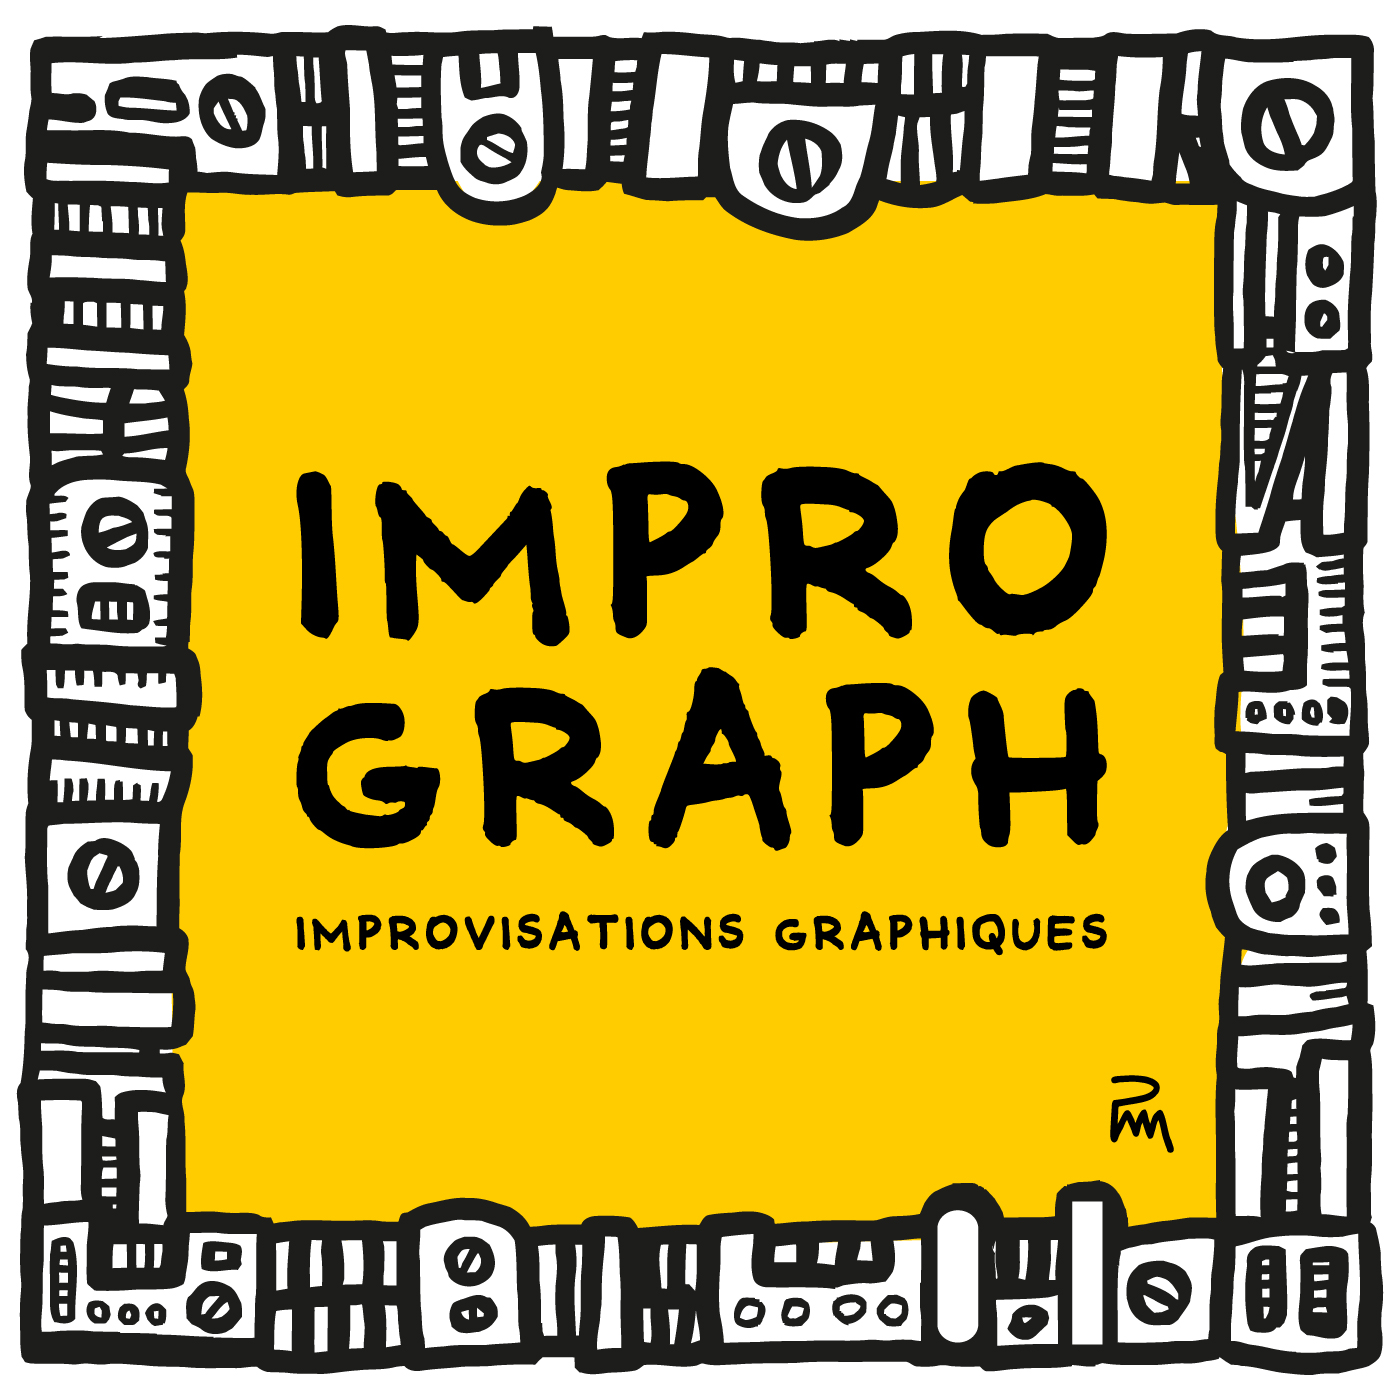 Imprograph